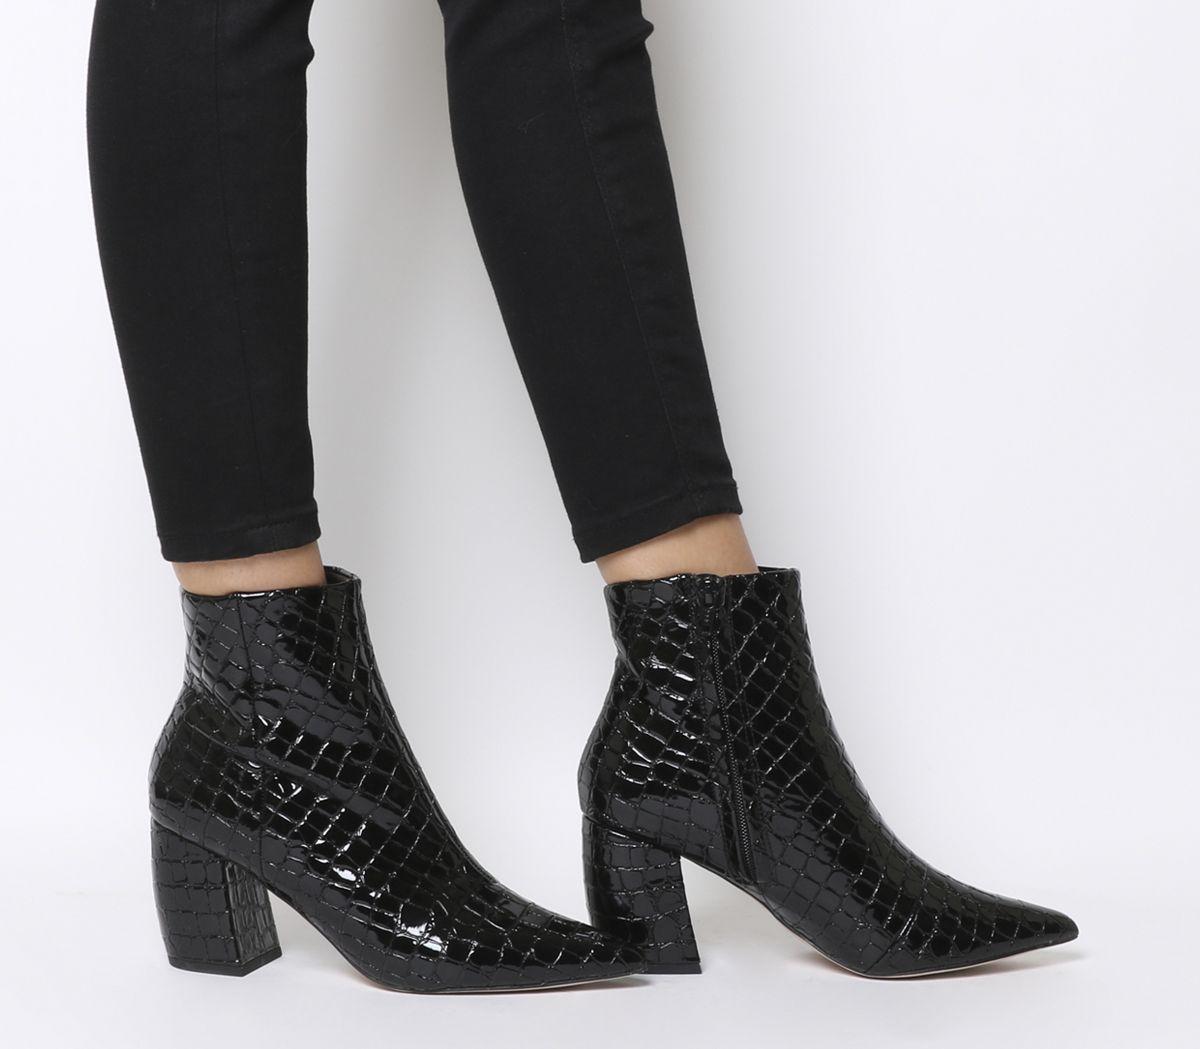 c36b4438570f Office Aloud Point Block Heel Boots Black Croc Patent - Ankle Boots